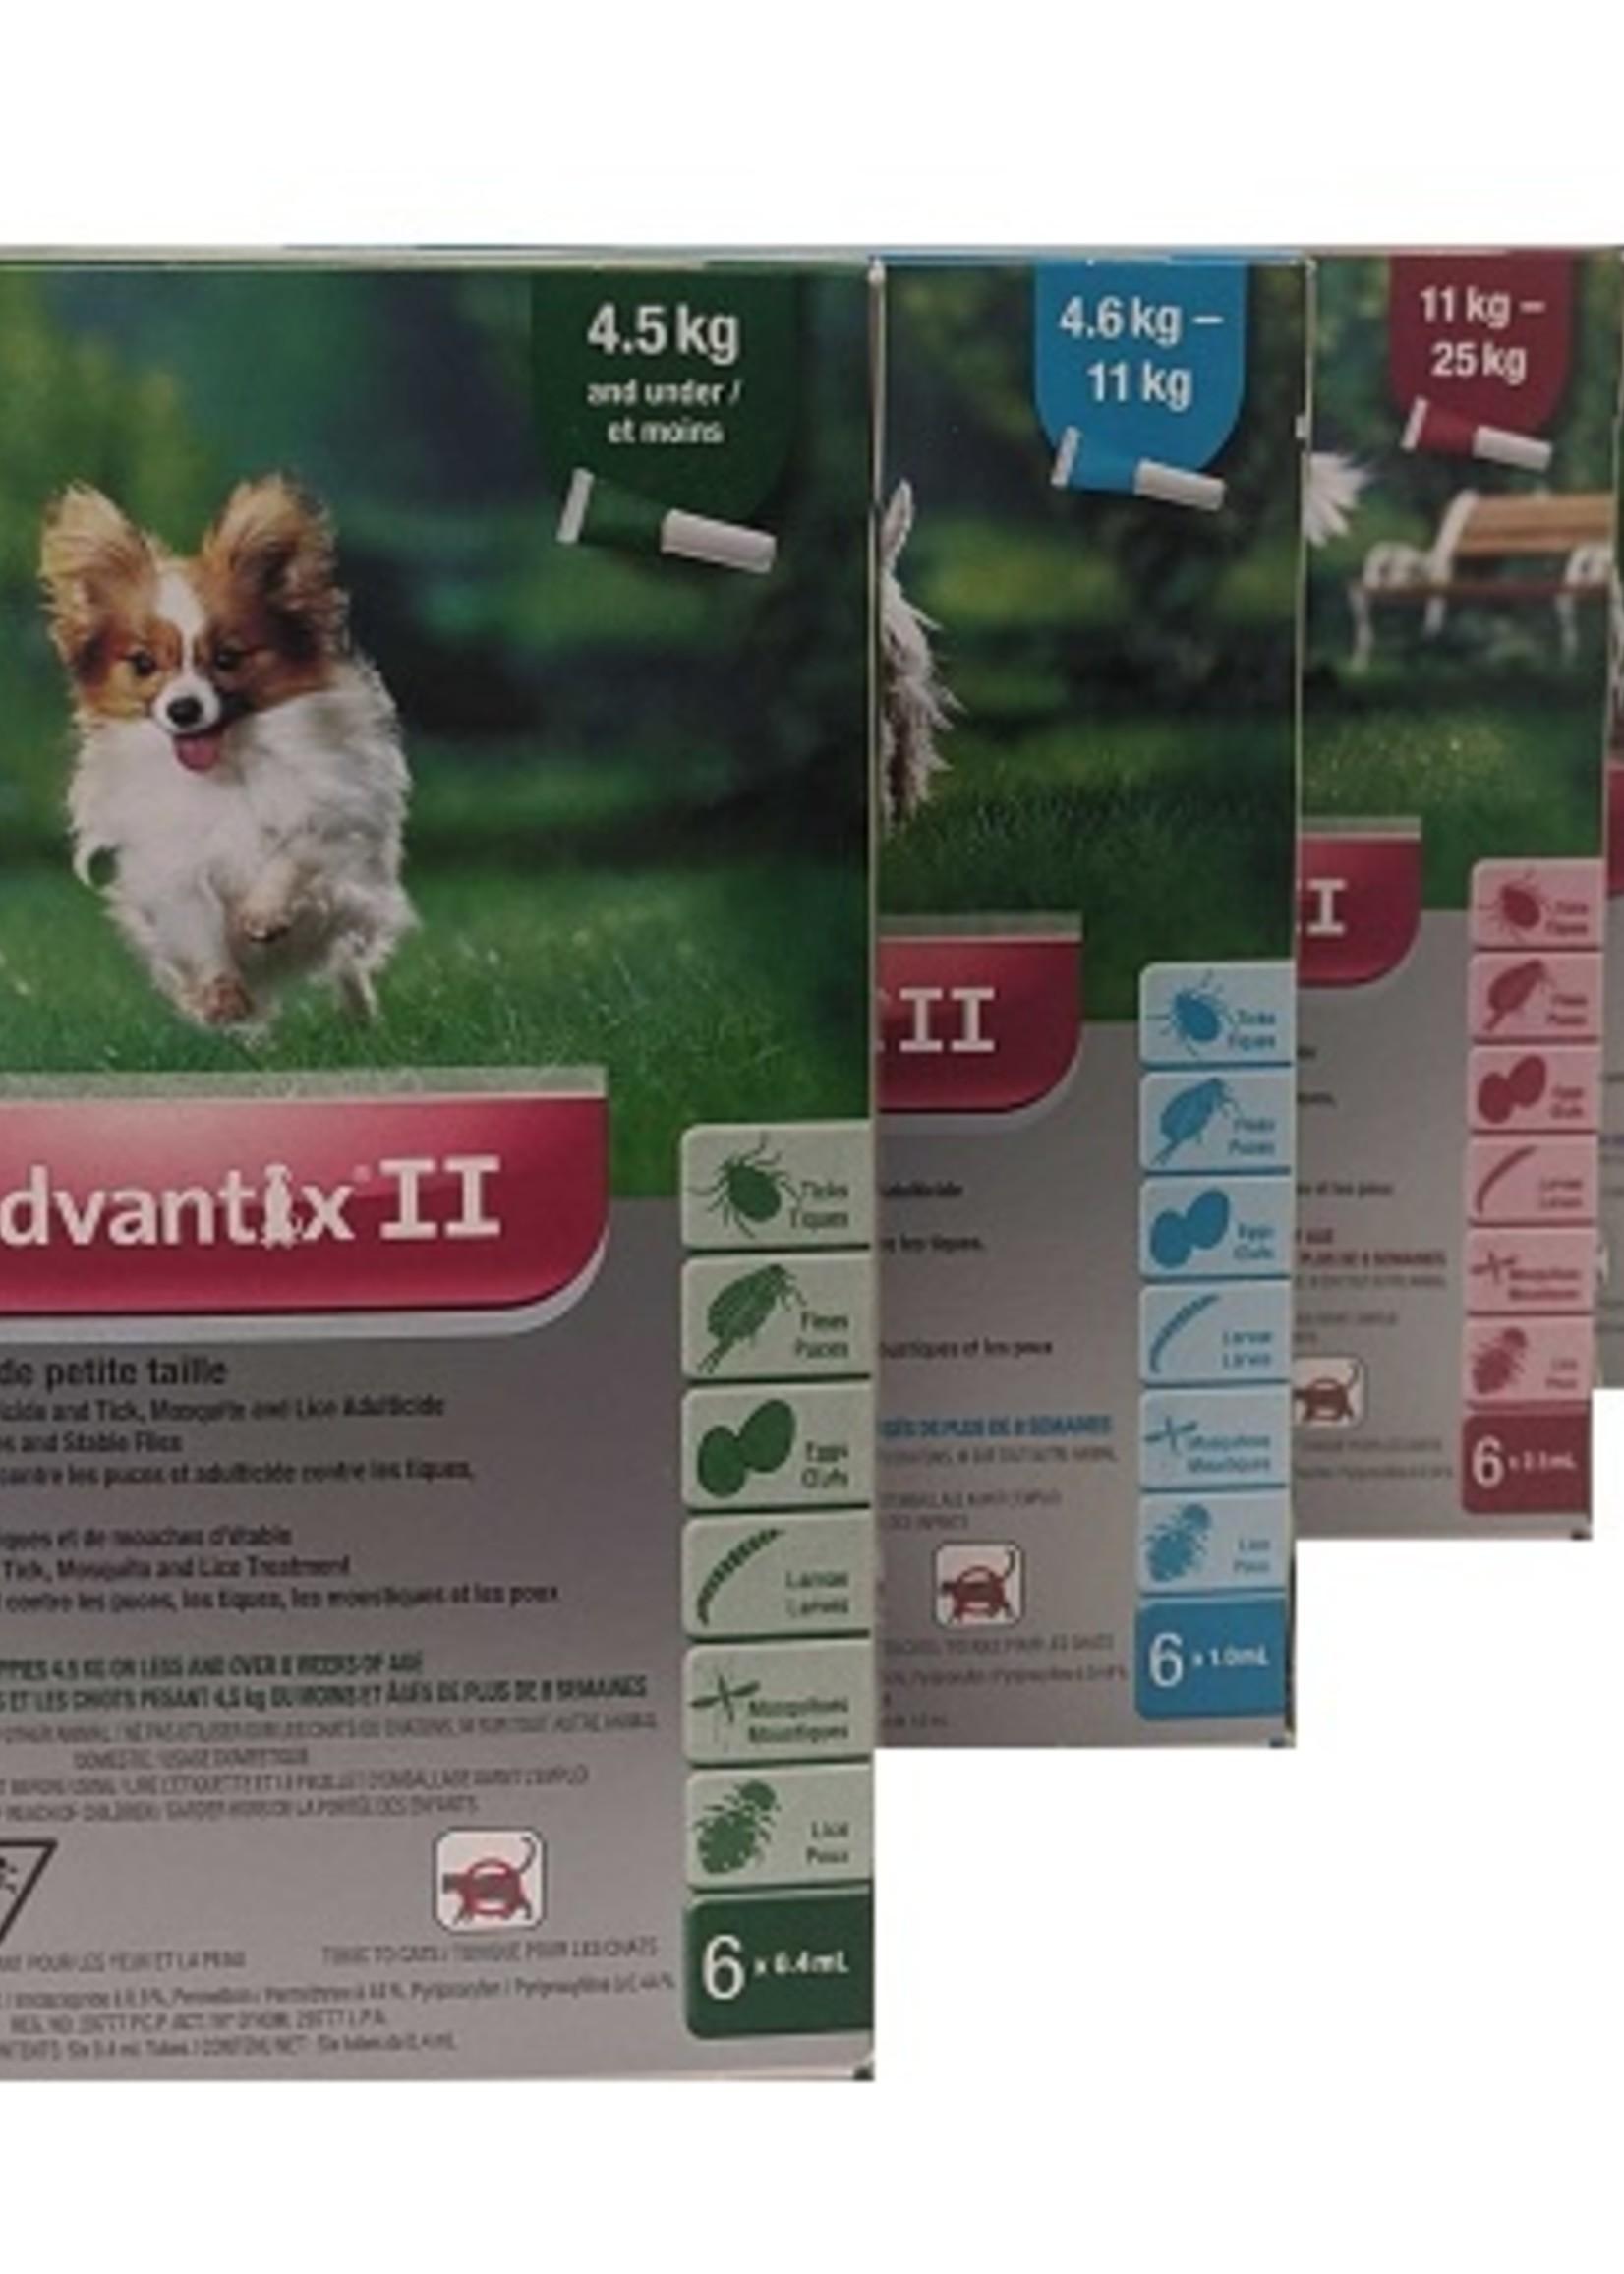 Bayer K9 Advantix II Medium Dog 6 Doses x1.0ml